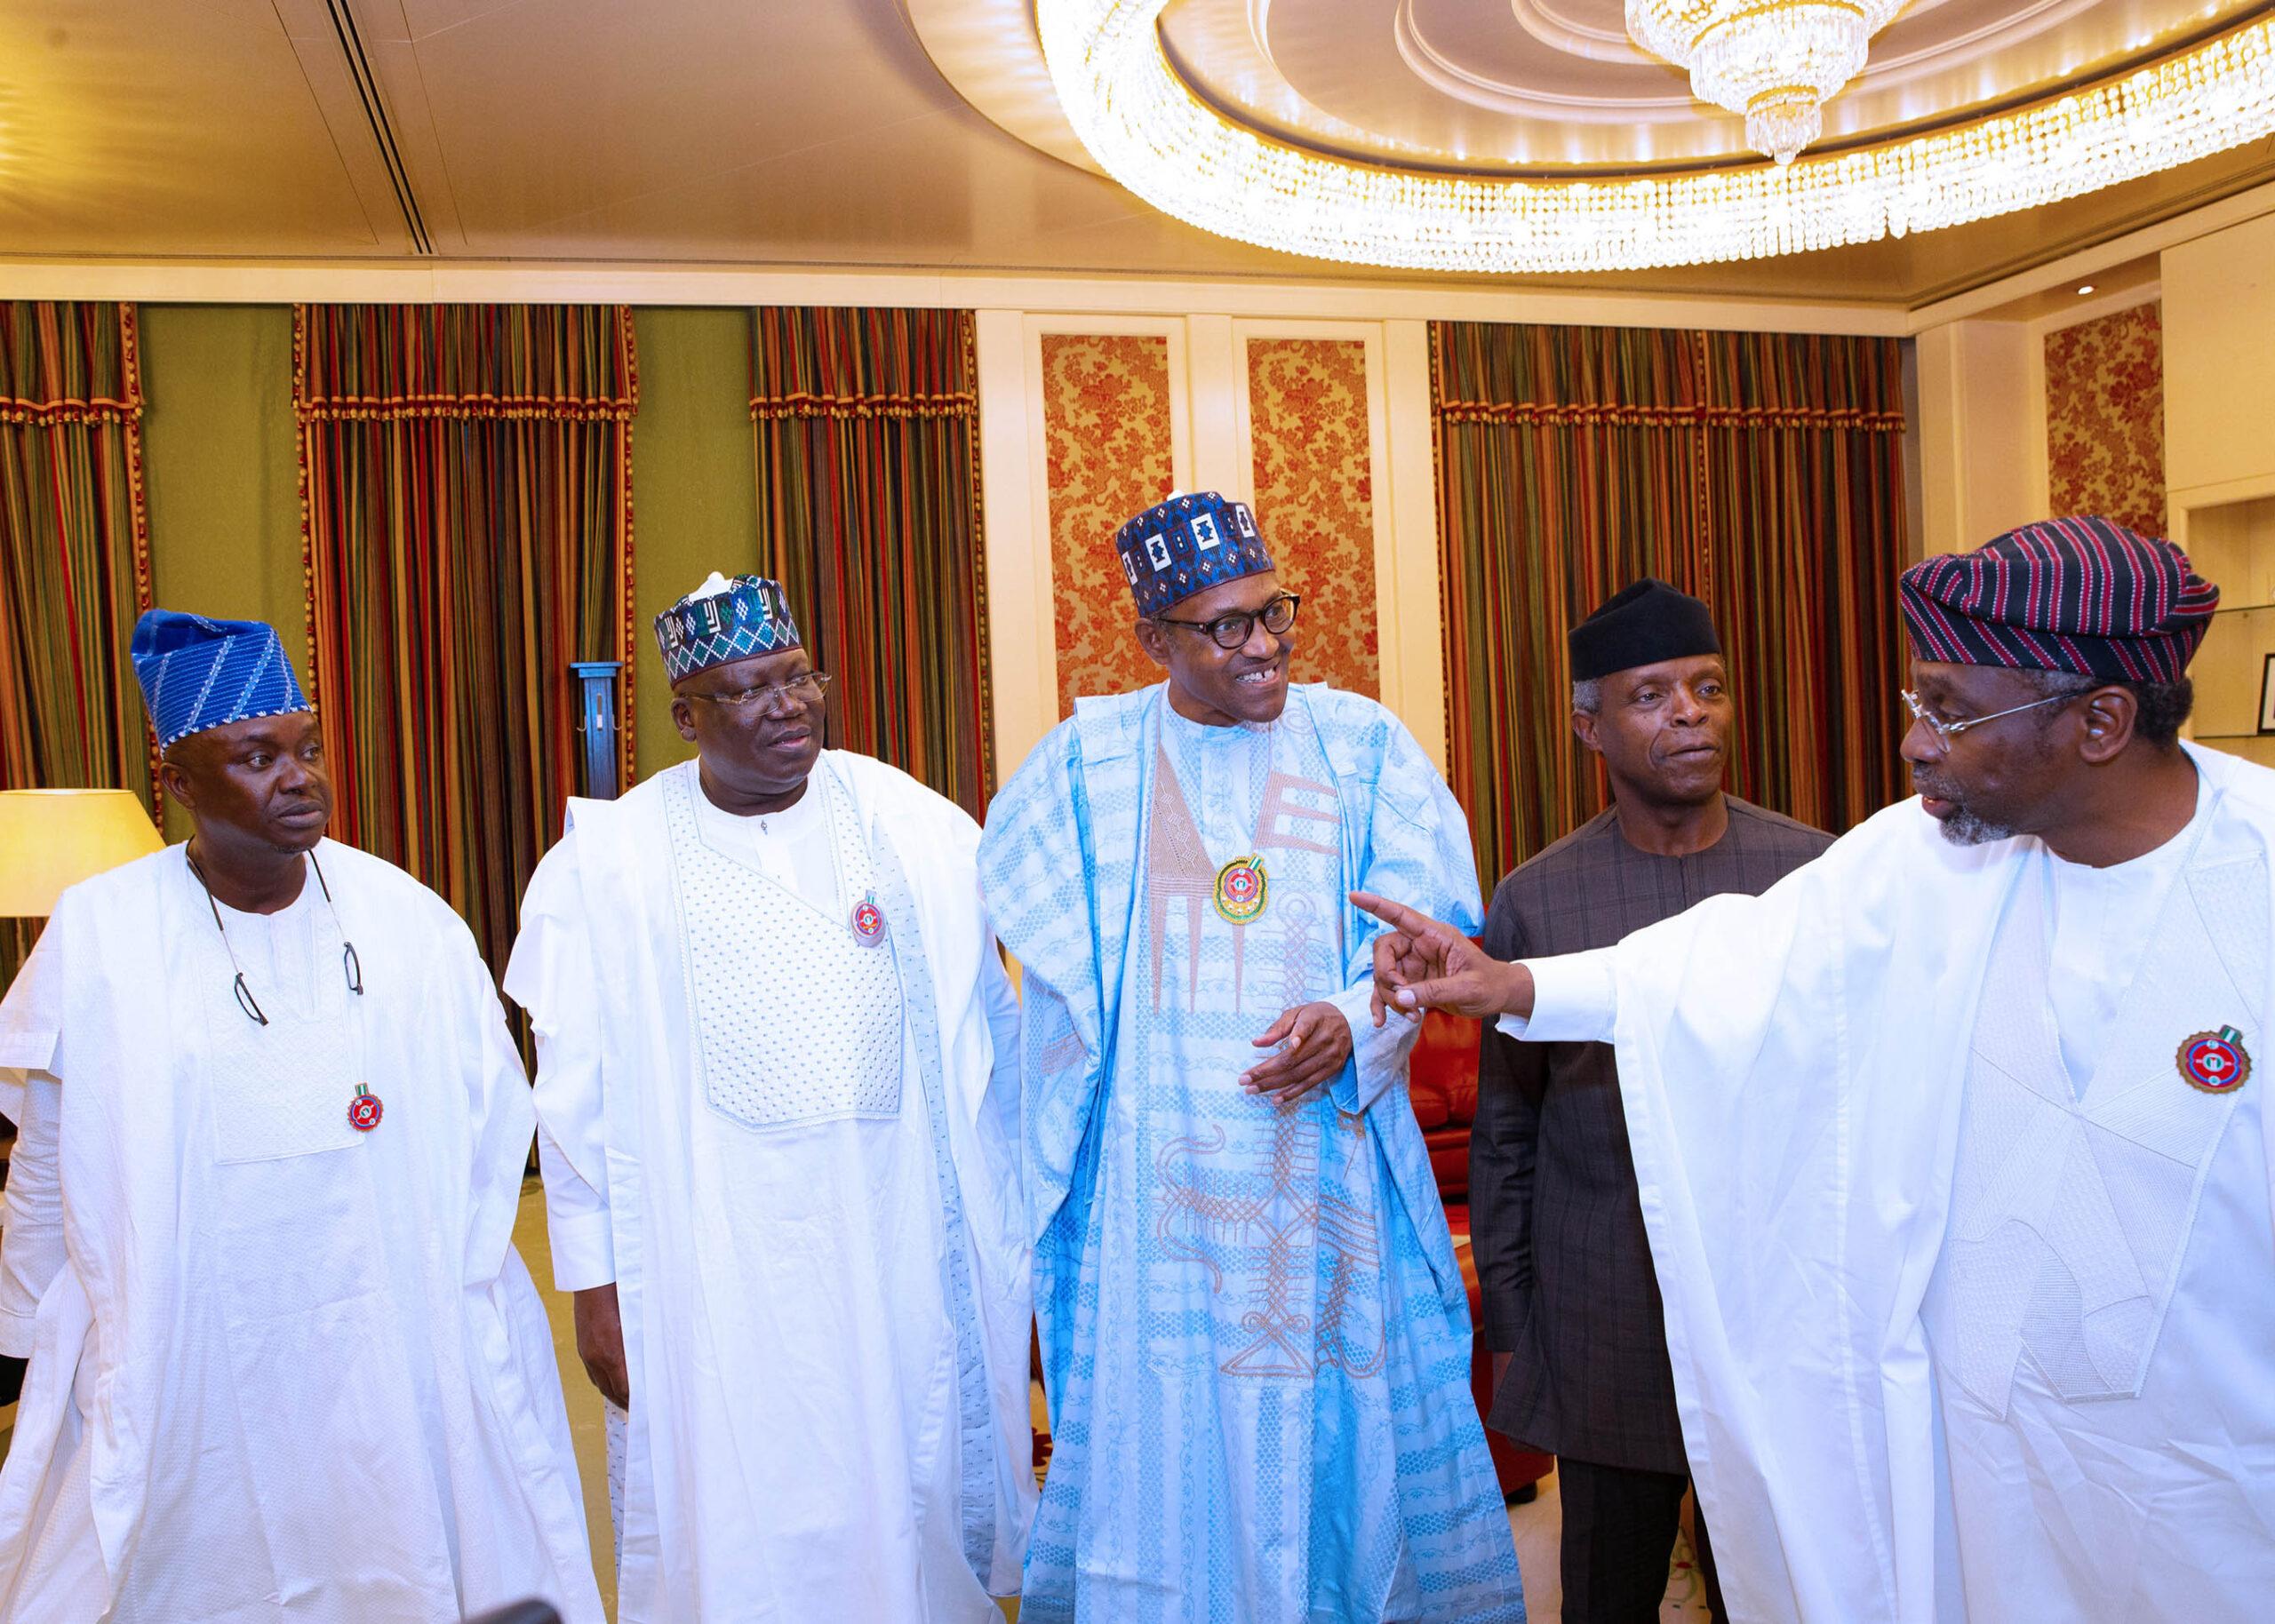 Consolidating the executive-legislature relationship for good governance